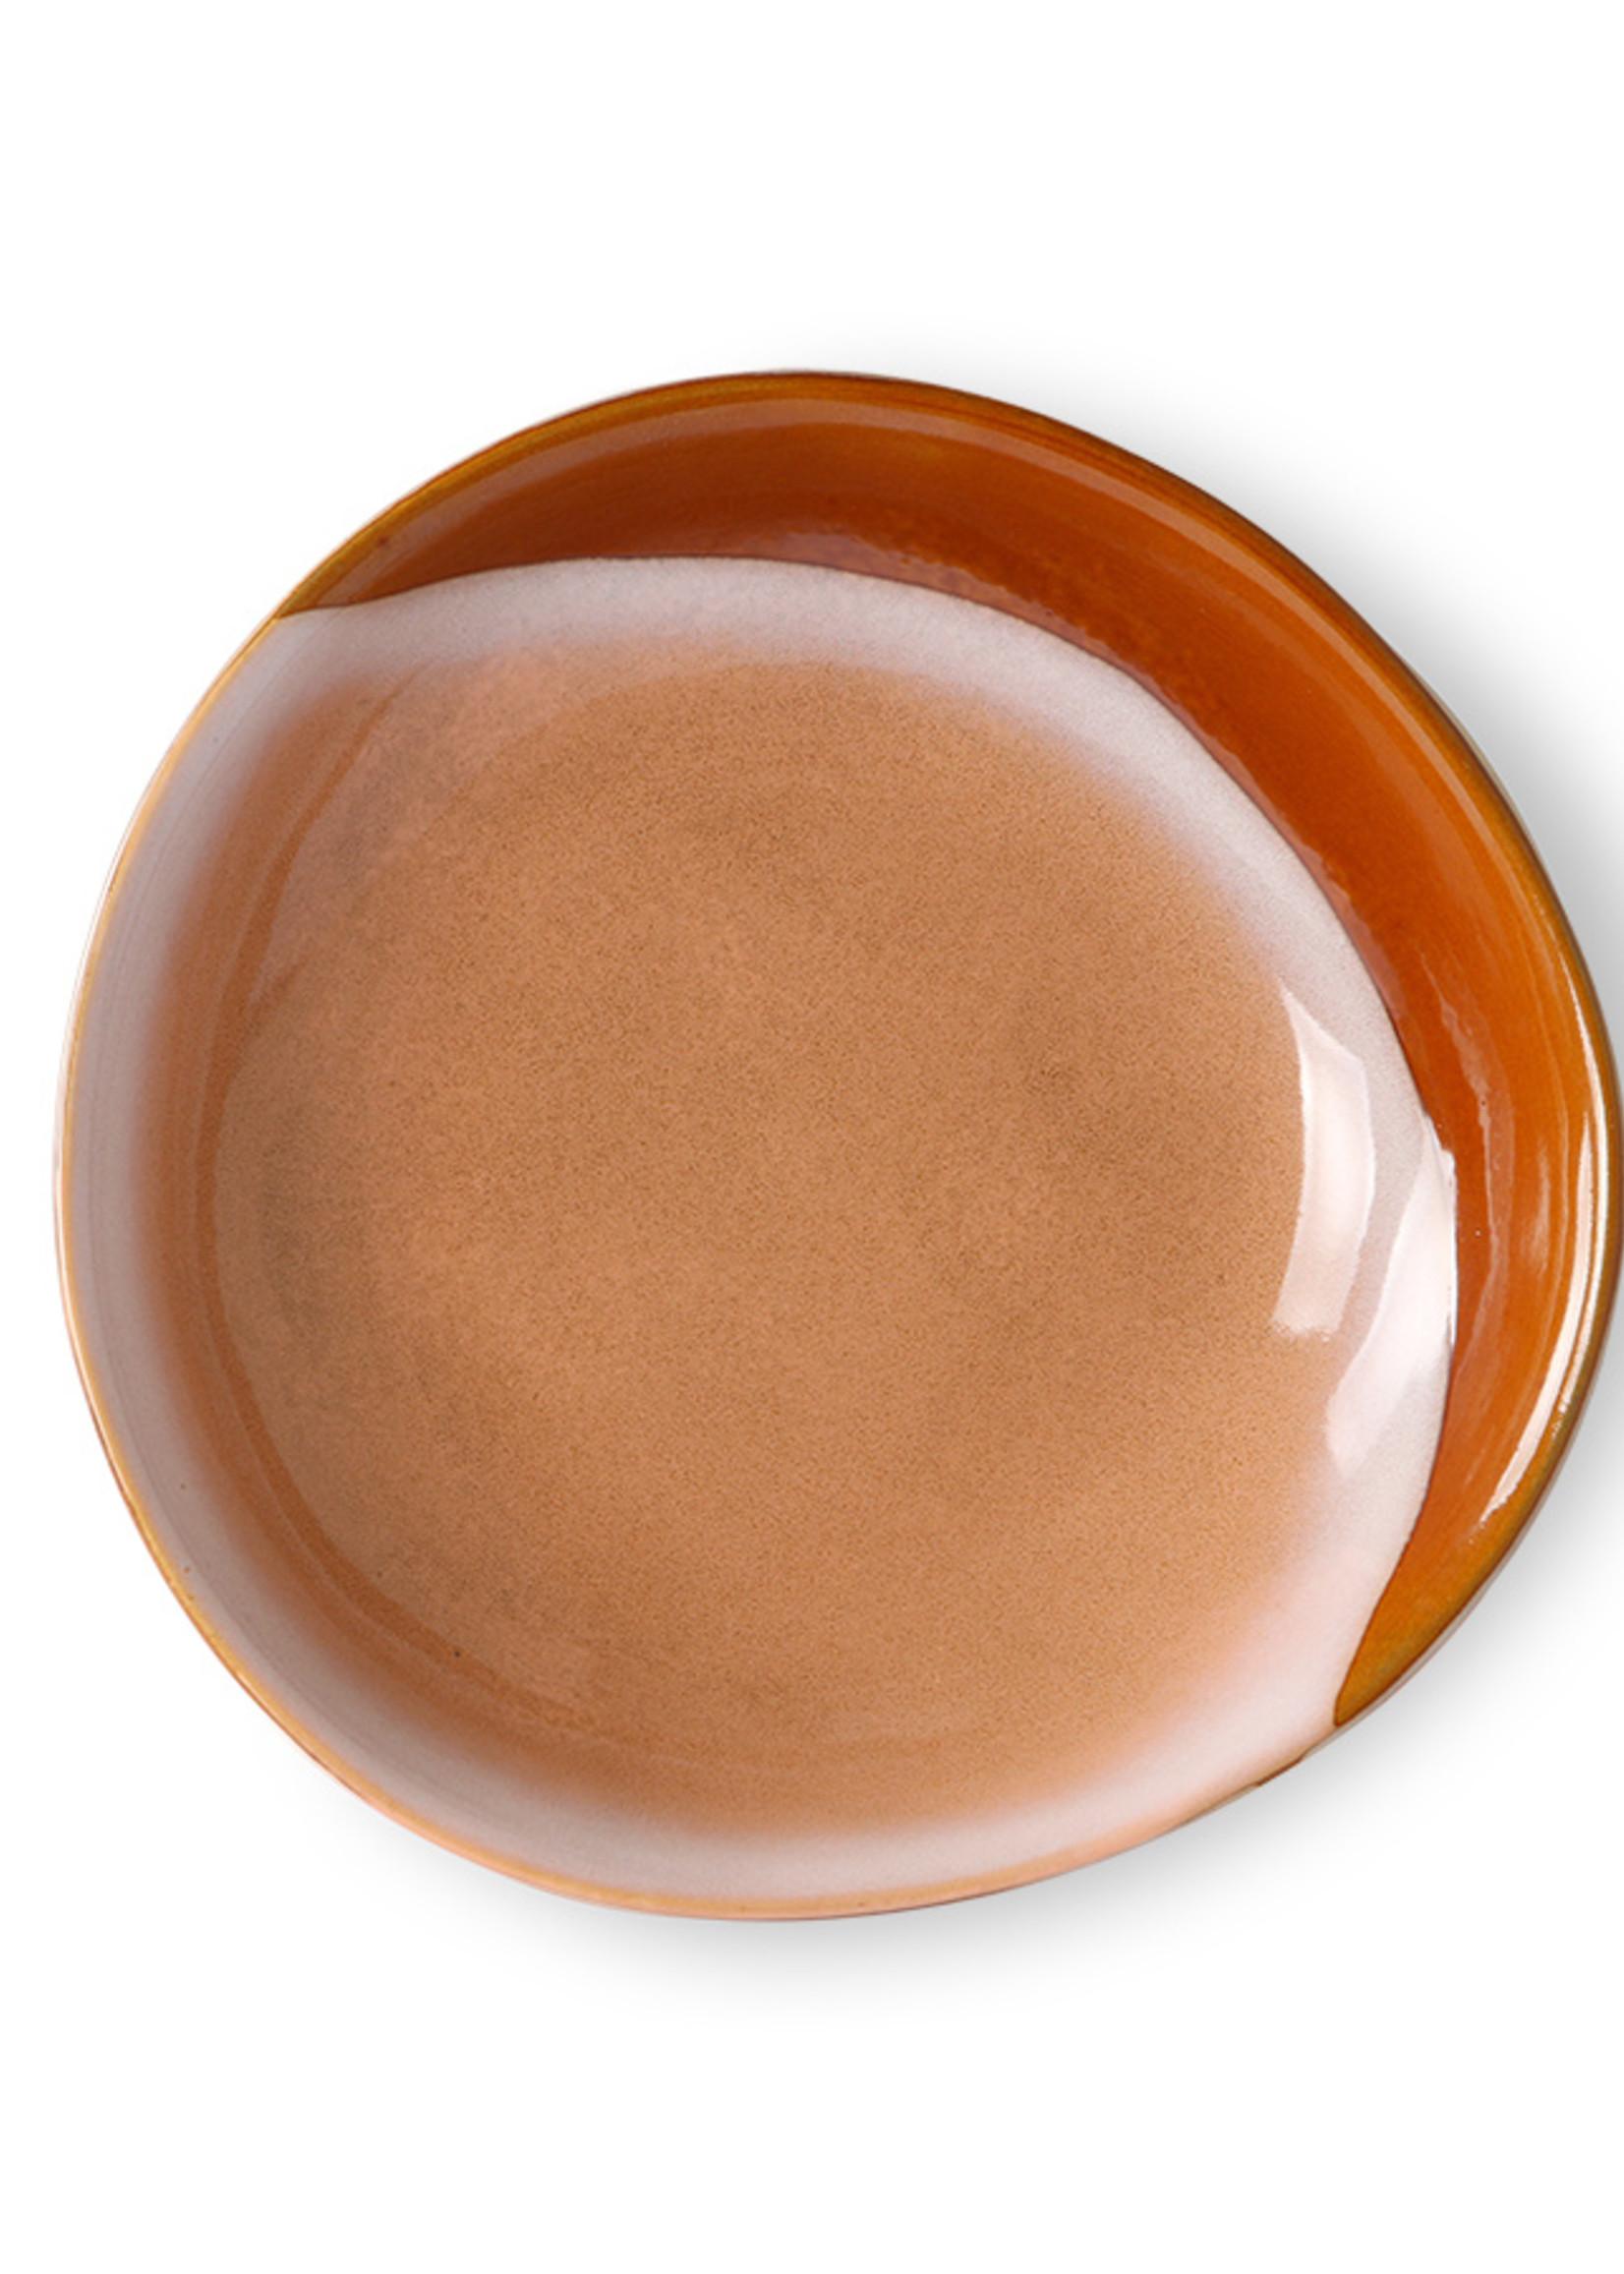 HK living Ceramic 70's Curry Bowl : Hills